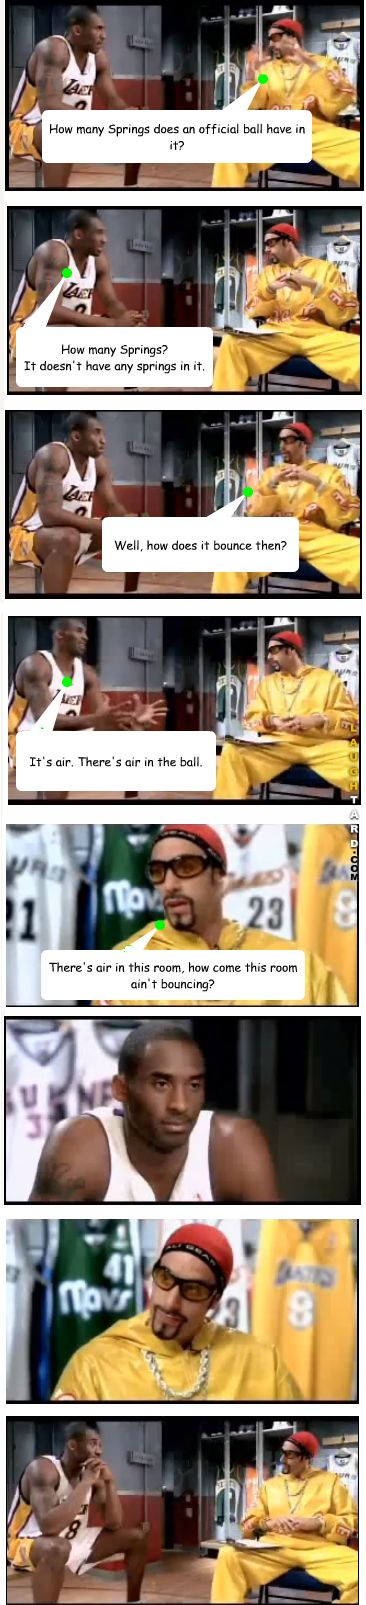 Funny Kobe Bryant Interview